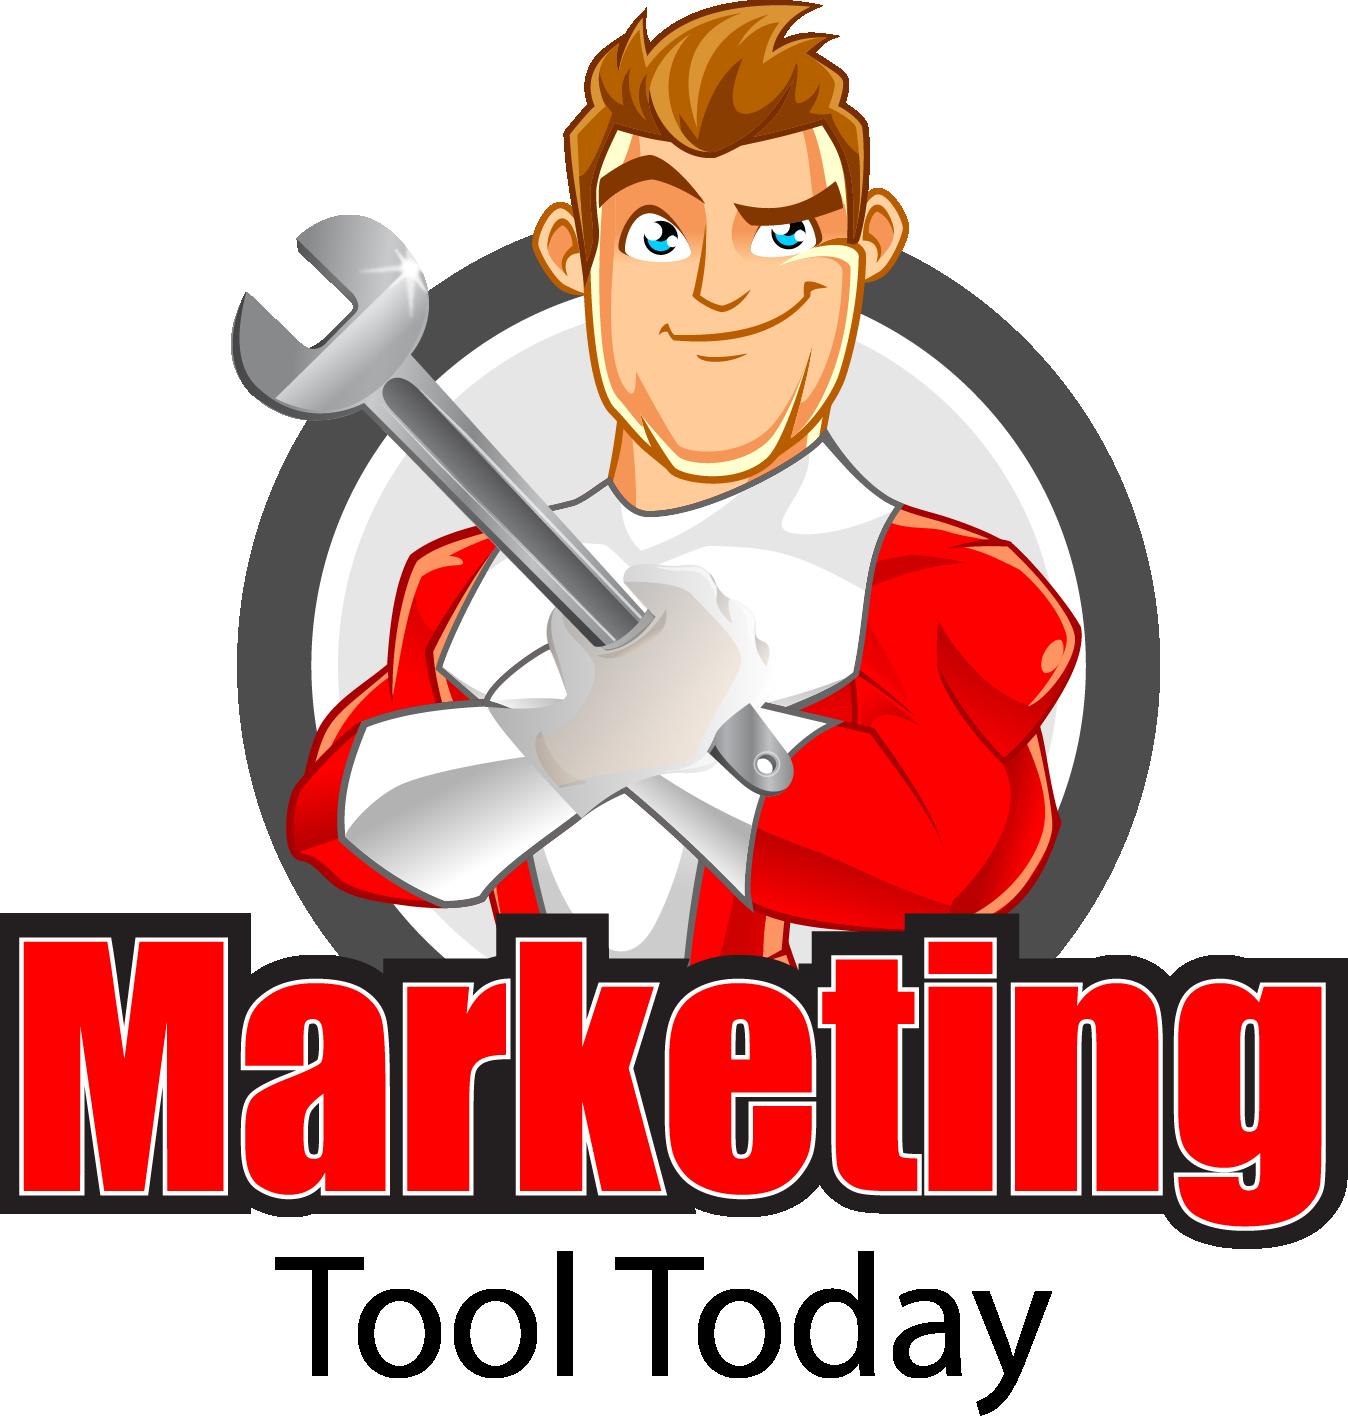 Information clipart marketer. Free internet marketing tools